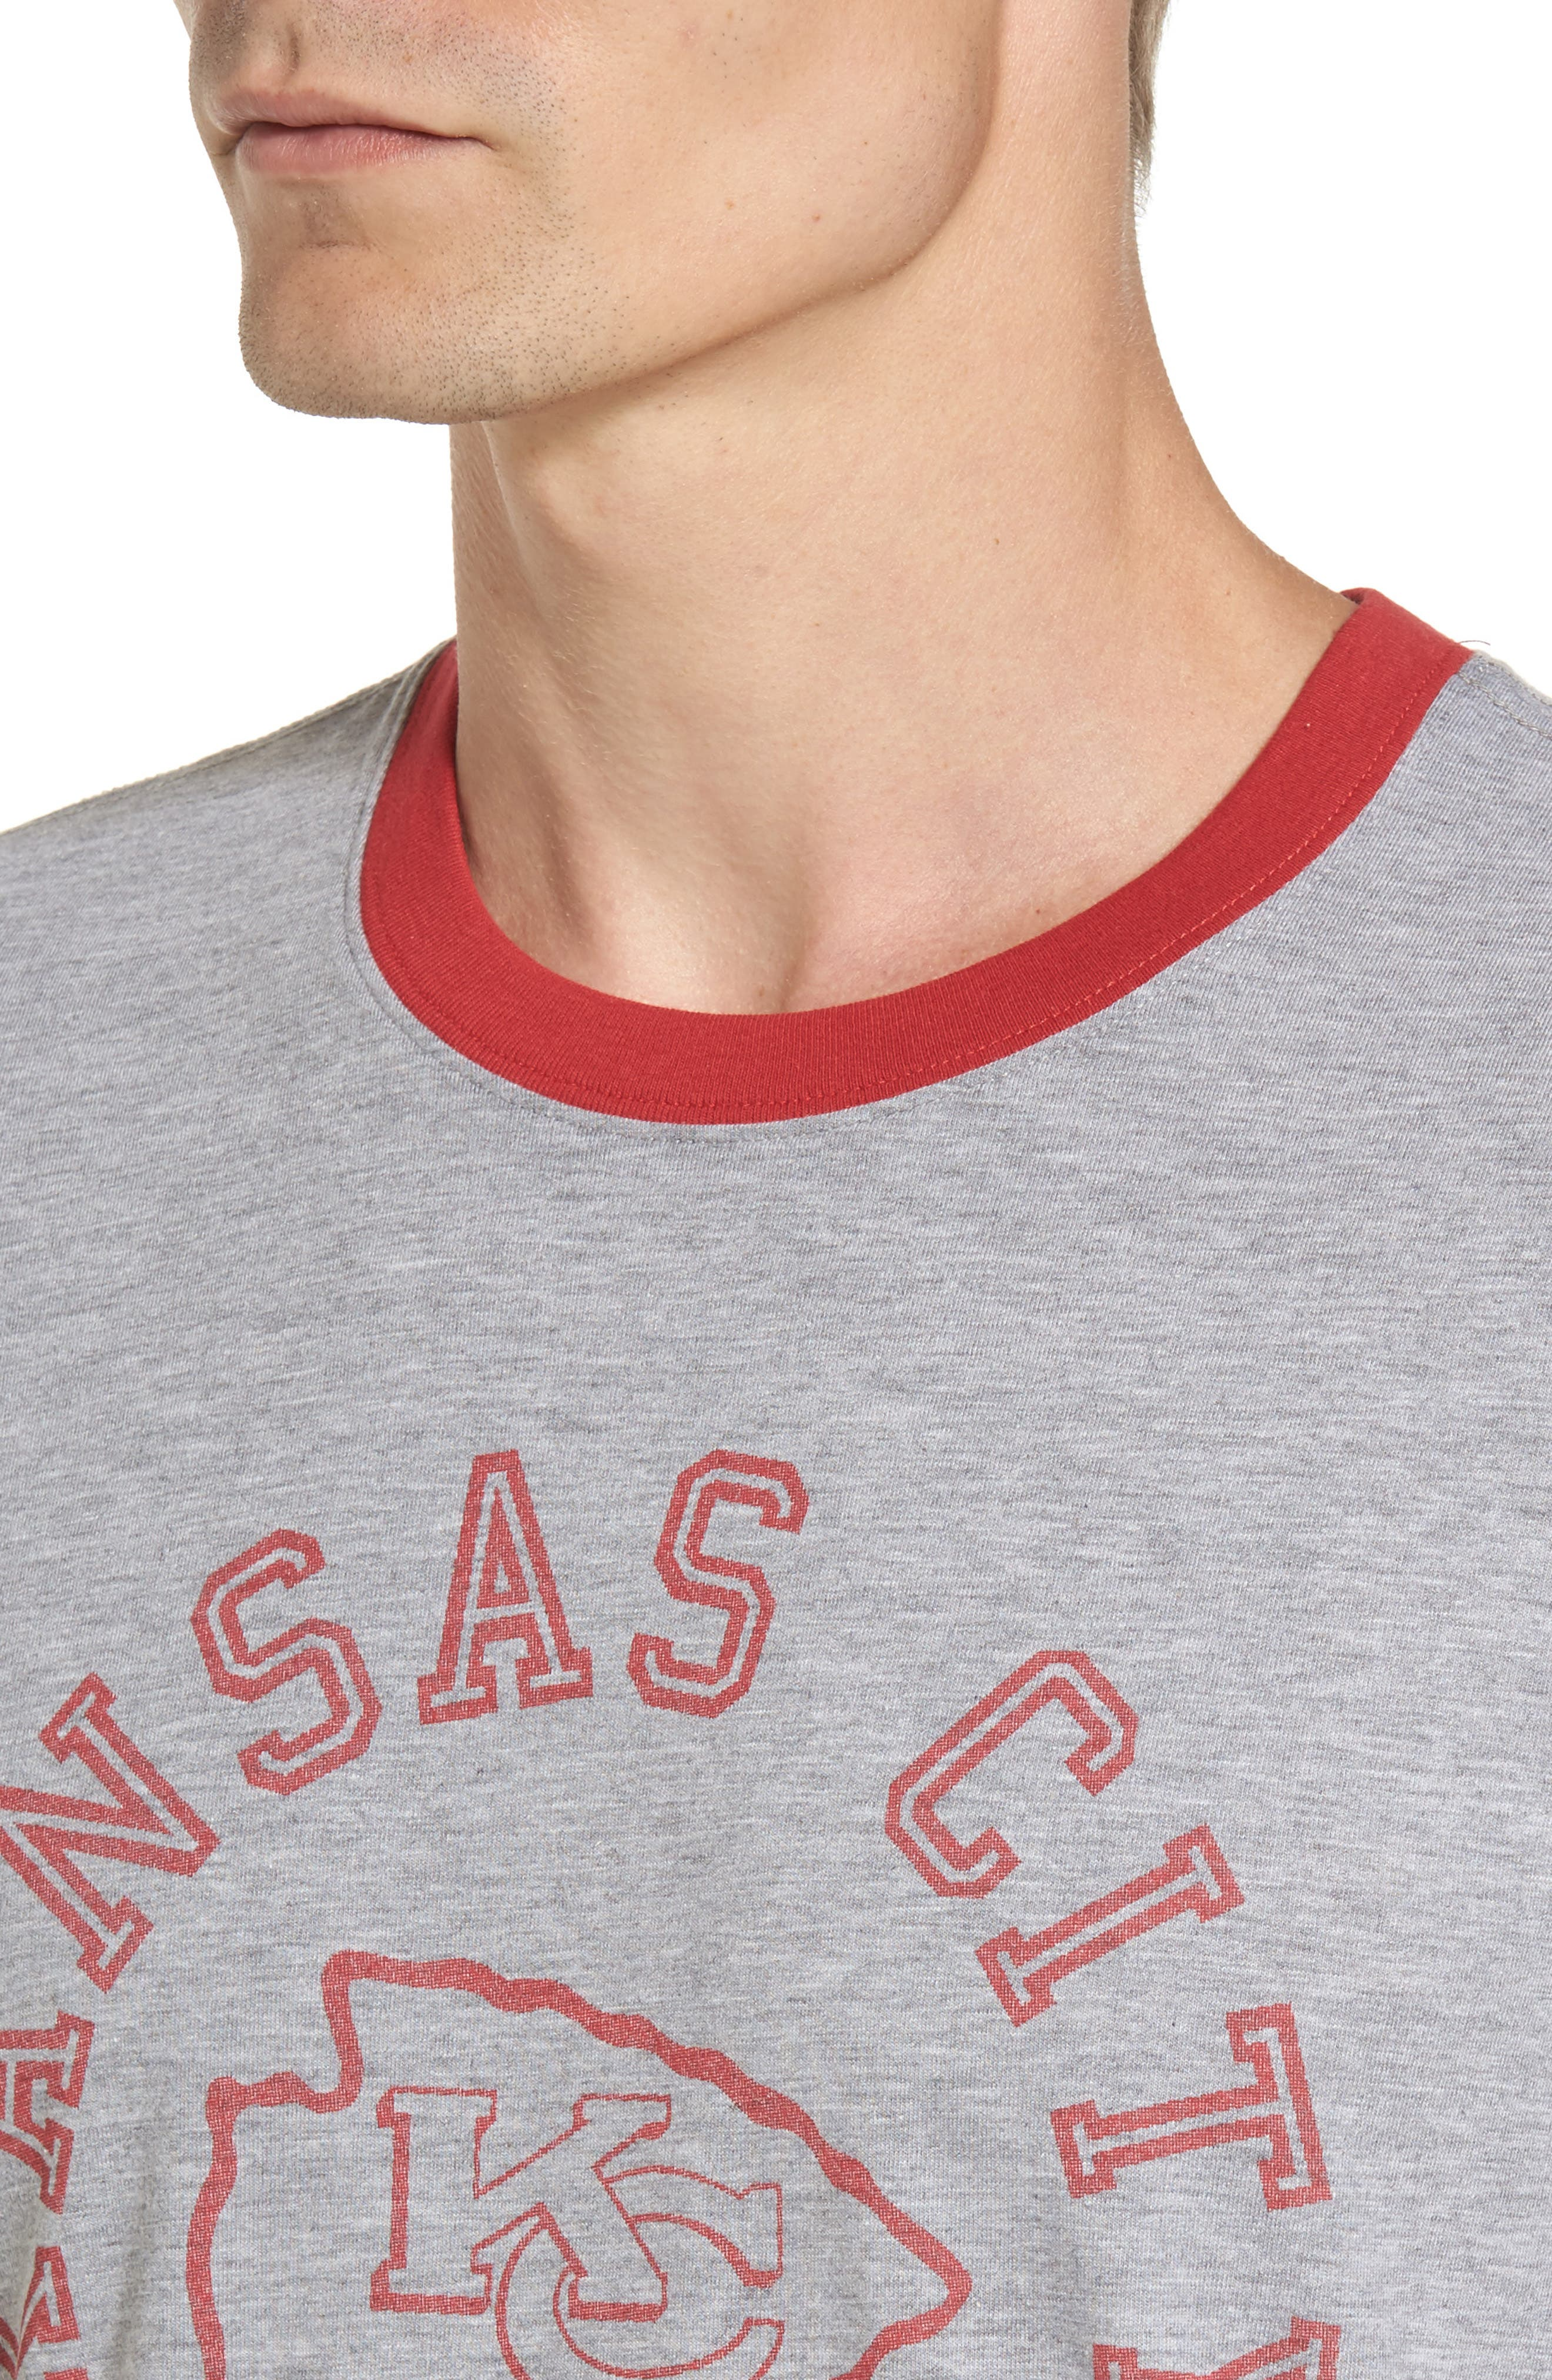 Kansas City Chiefs Ringer T-Shirt,                             Alternate thumbnail 4, color,                             Grey